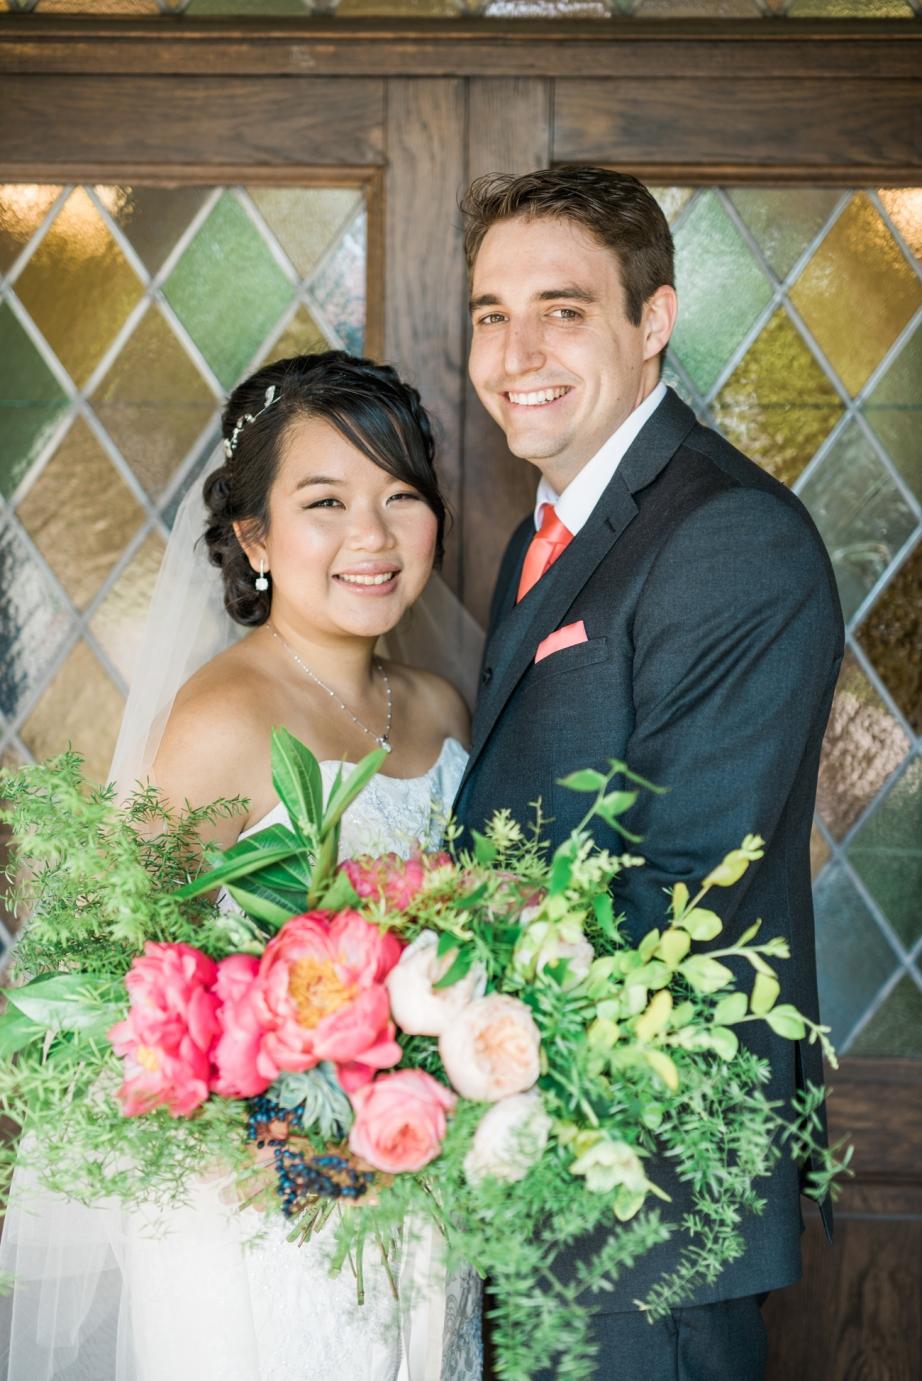 st-marks-episcopal-church-wedding-photo-027